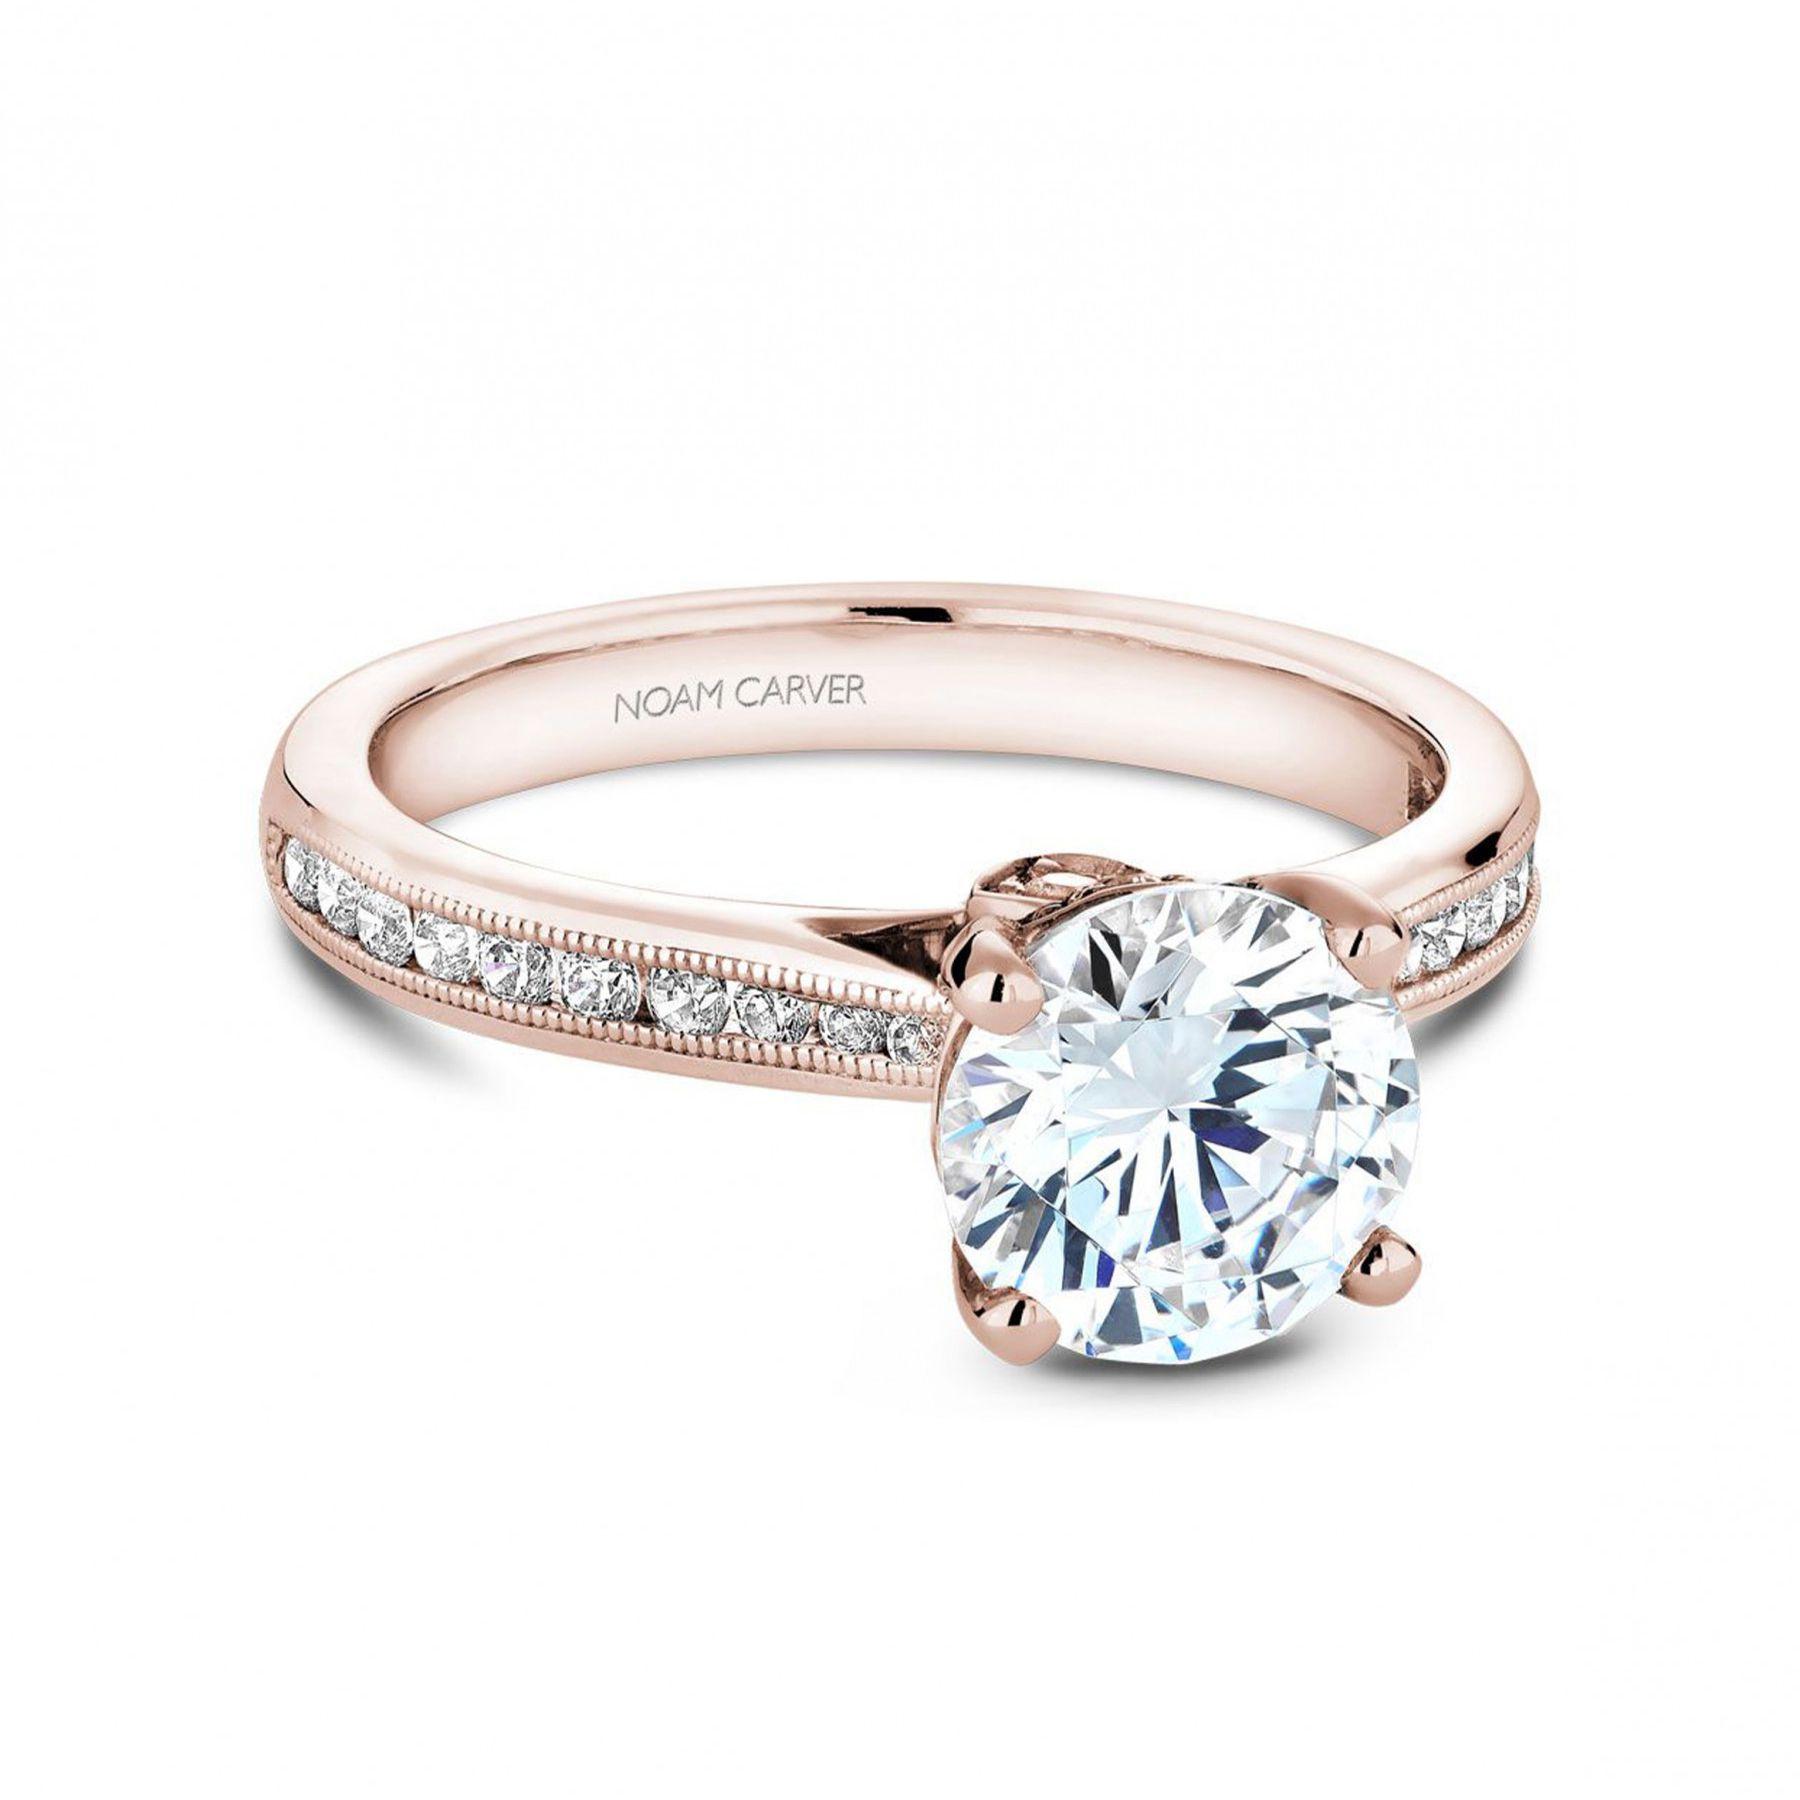 J.R. Dunn Noam Carver Round Channel-Set Engagement Ring Setting